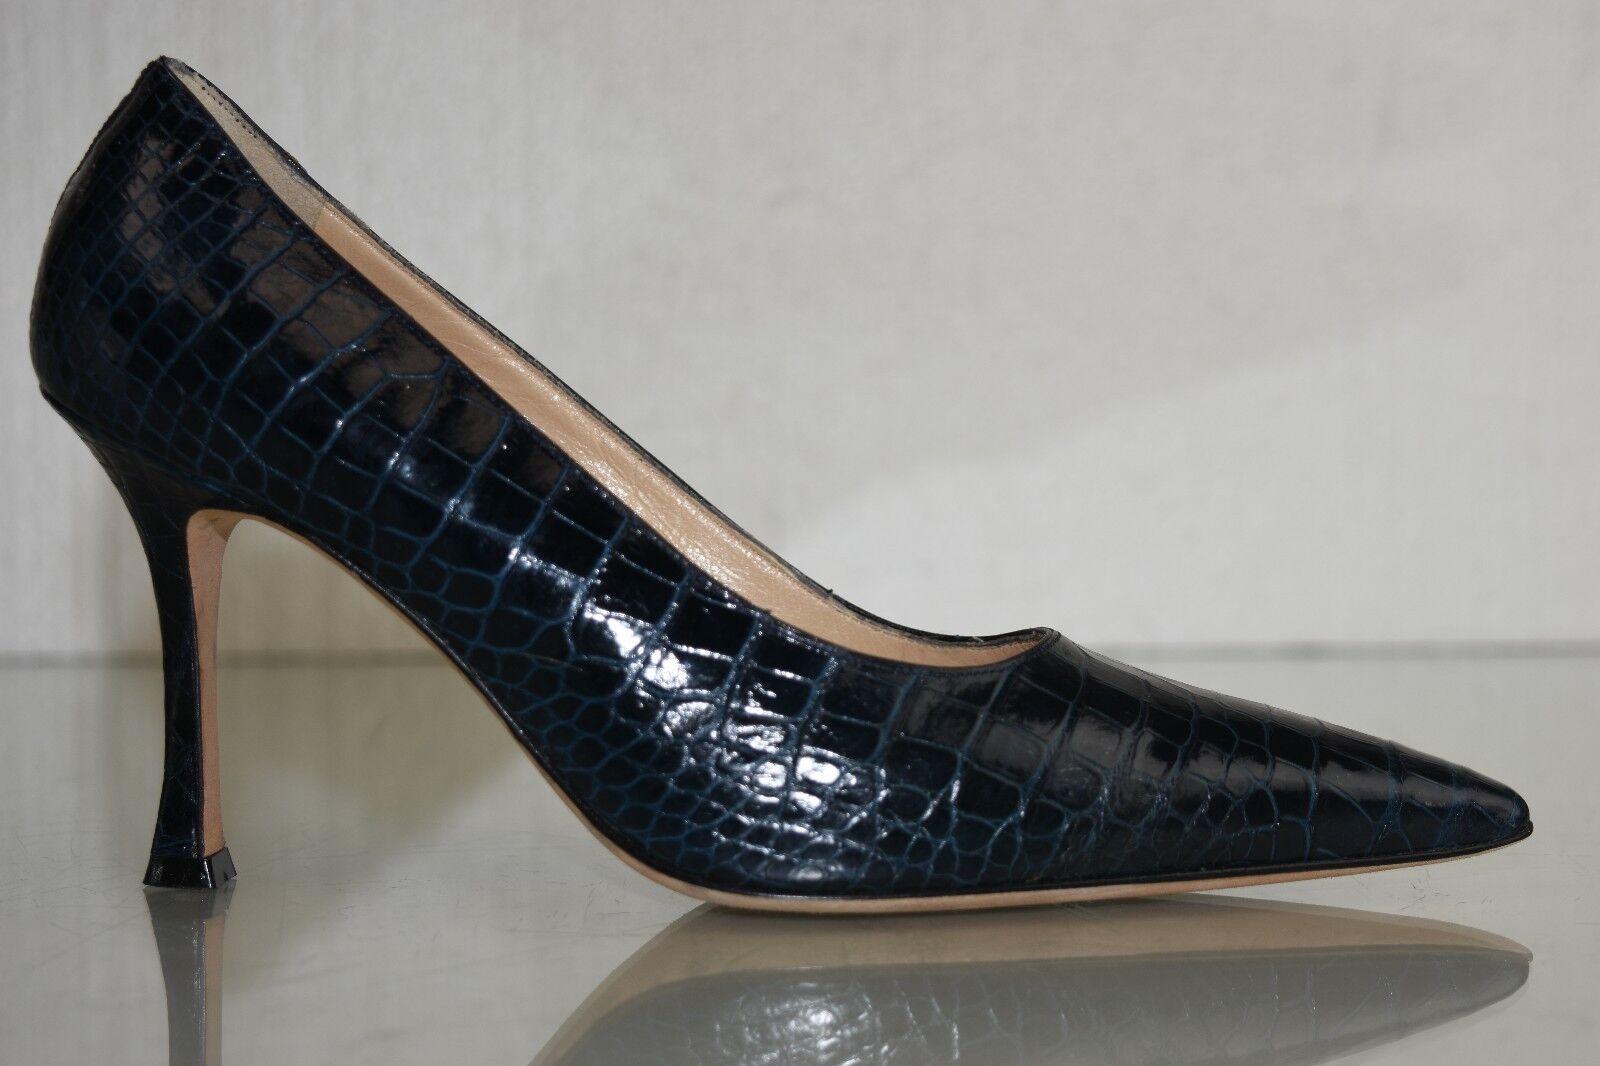 Neuf Manolo Blahnik Bleu Marine Alligator Crocodile Chaussures 37.5 Bb Talons 37.5 Chaussures 7cb9cc